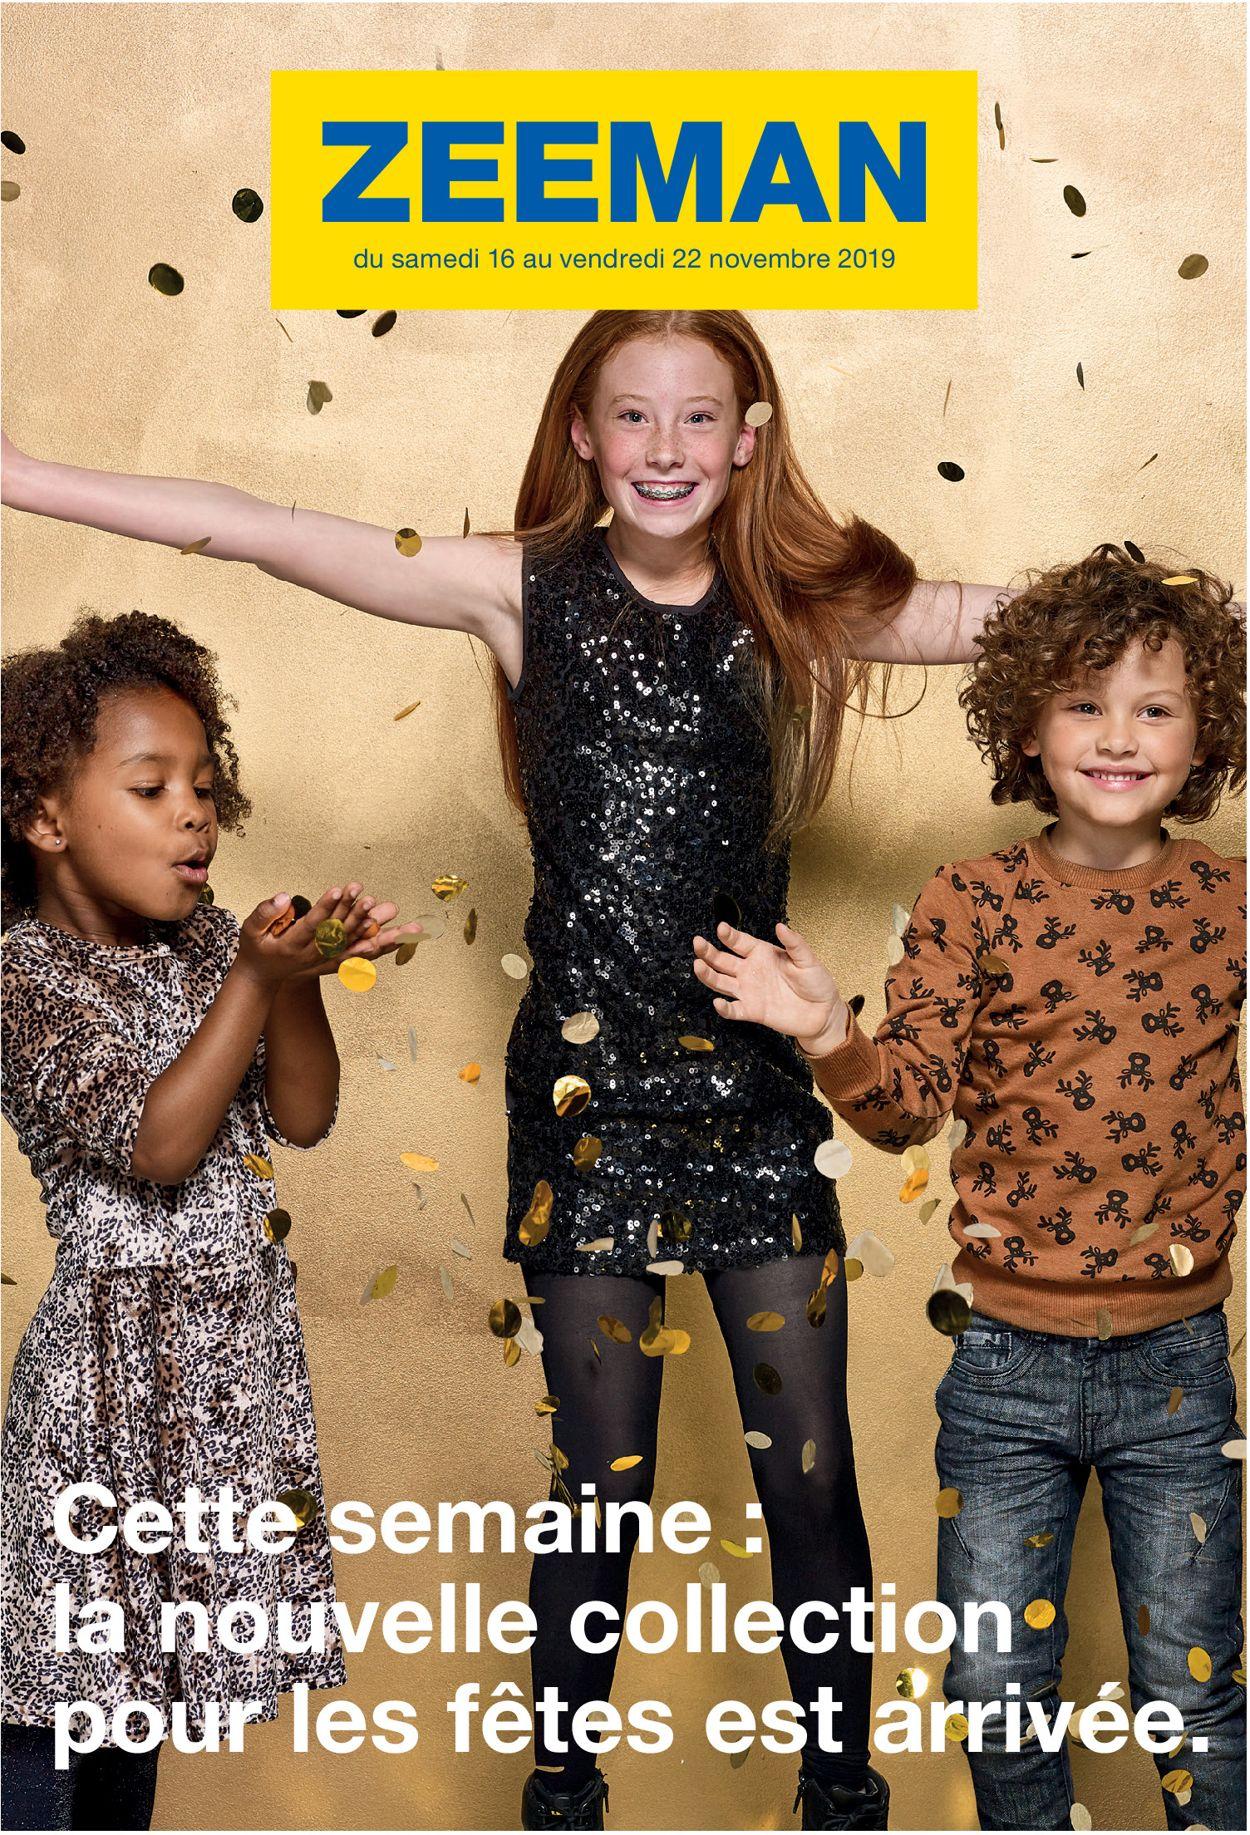 Zeeman Catalogue - 16.11-22.11.2019